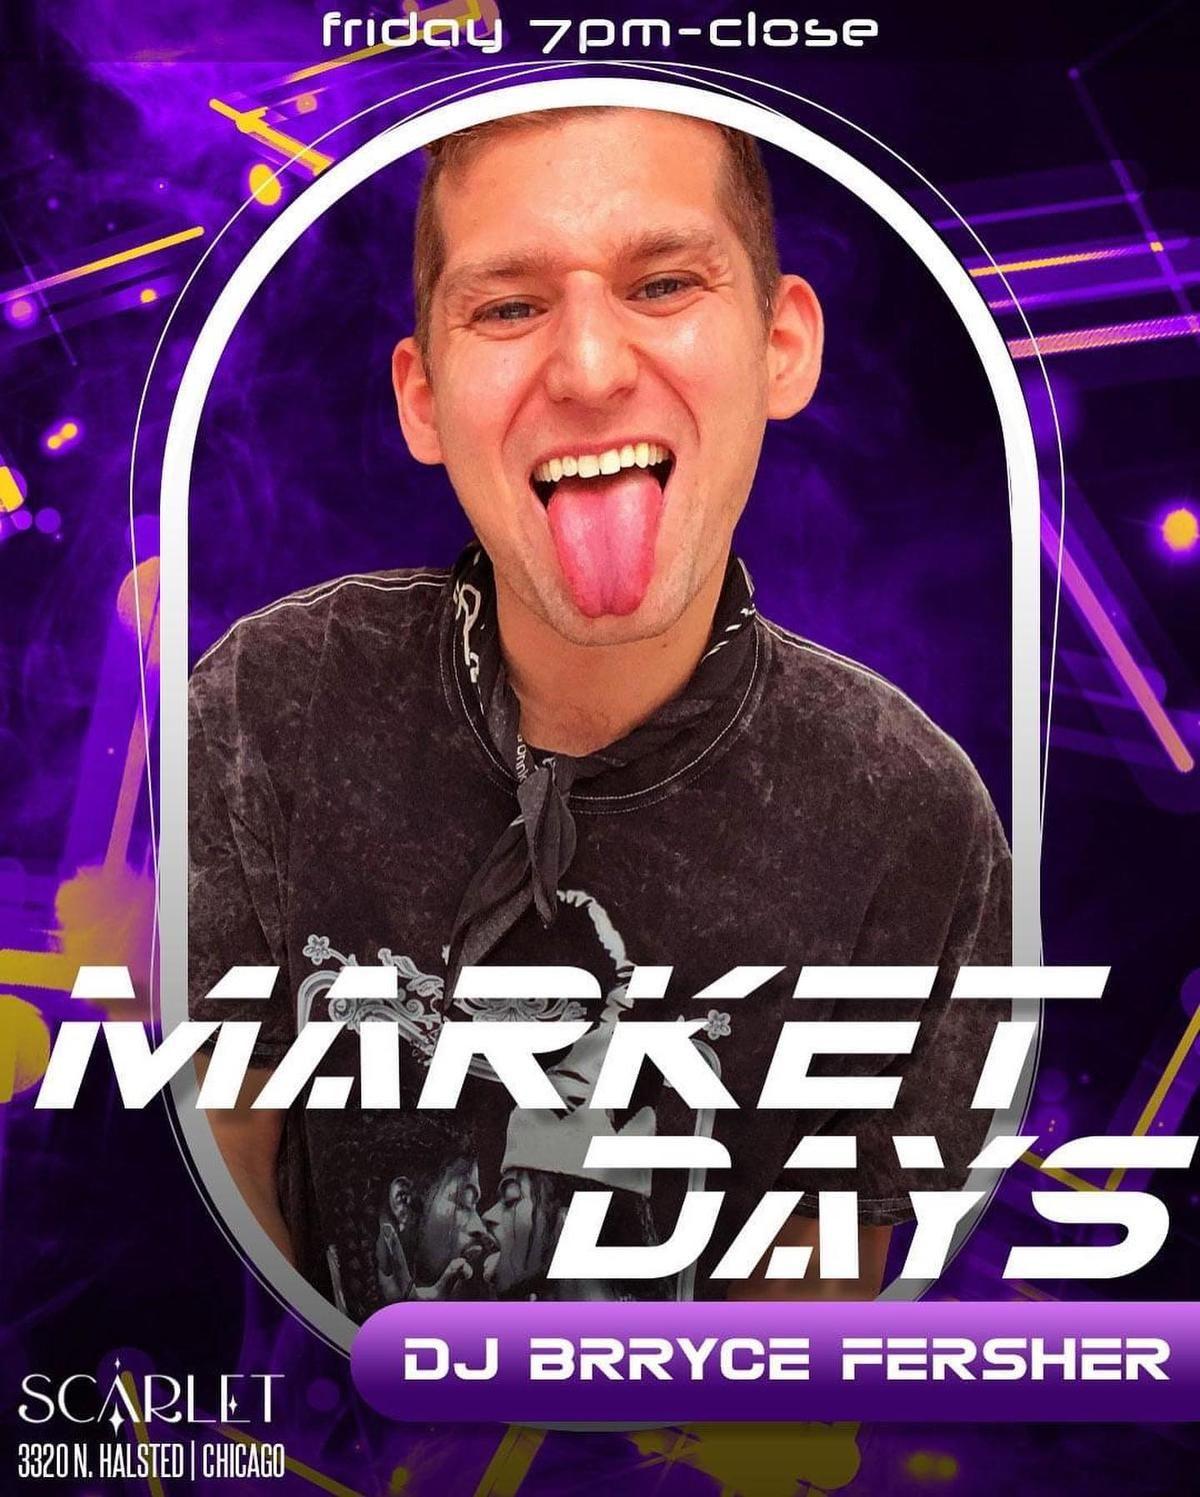 Scarlet Market Days: DJ Brryce Fersher